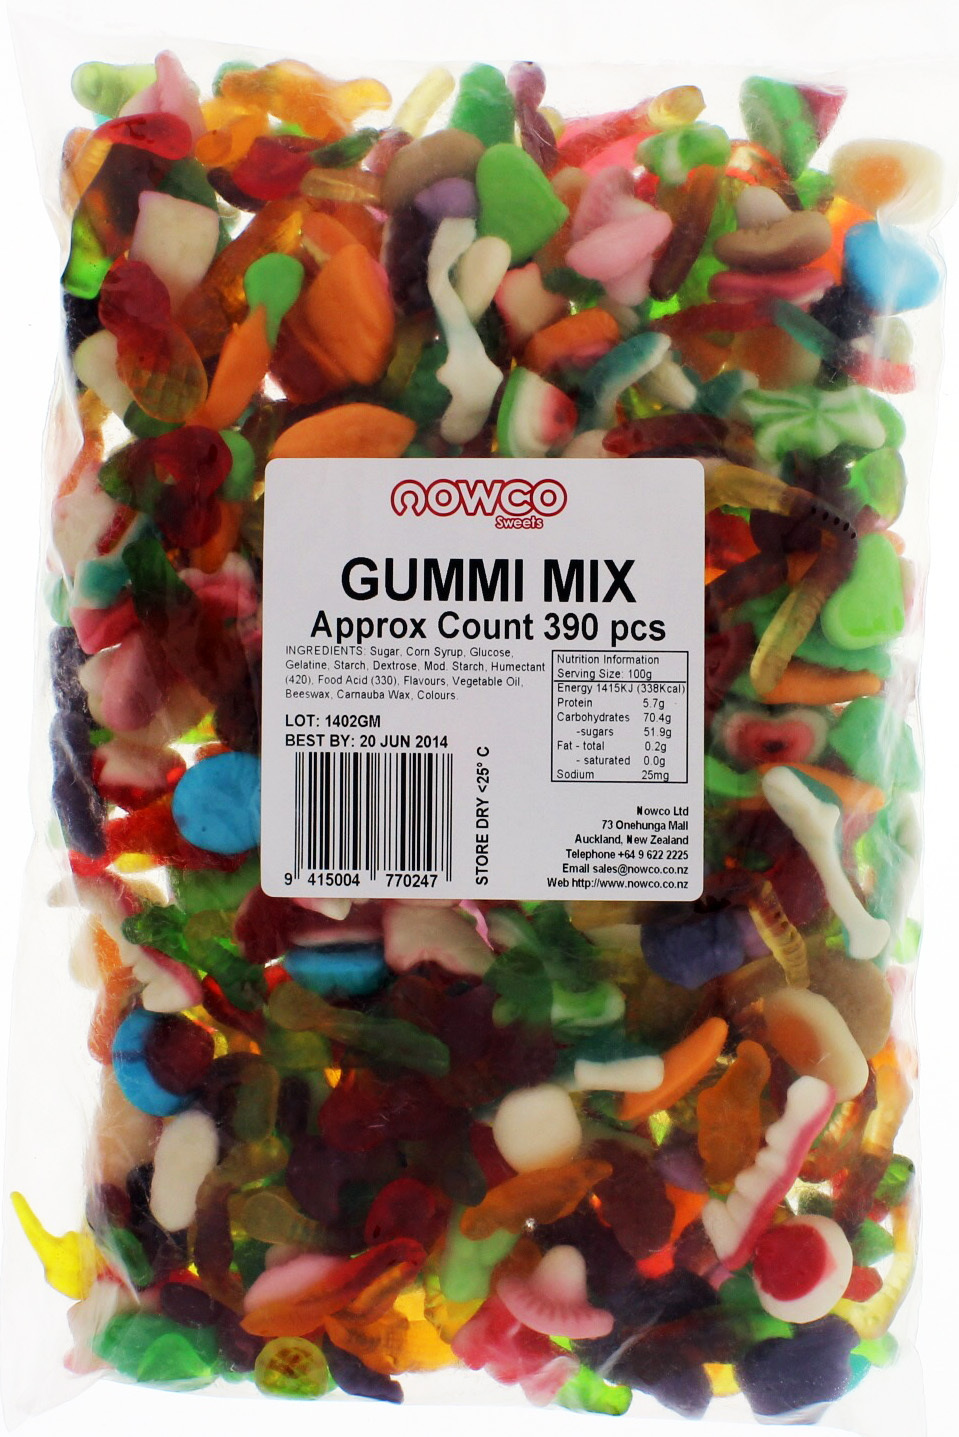 Nowco Gummi Mix 1.9kg image